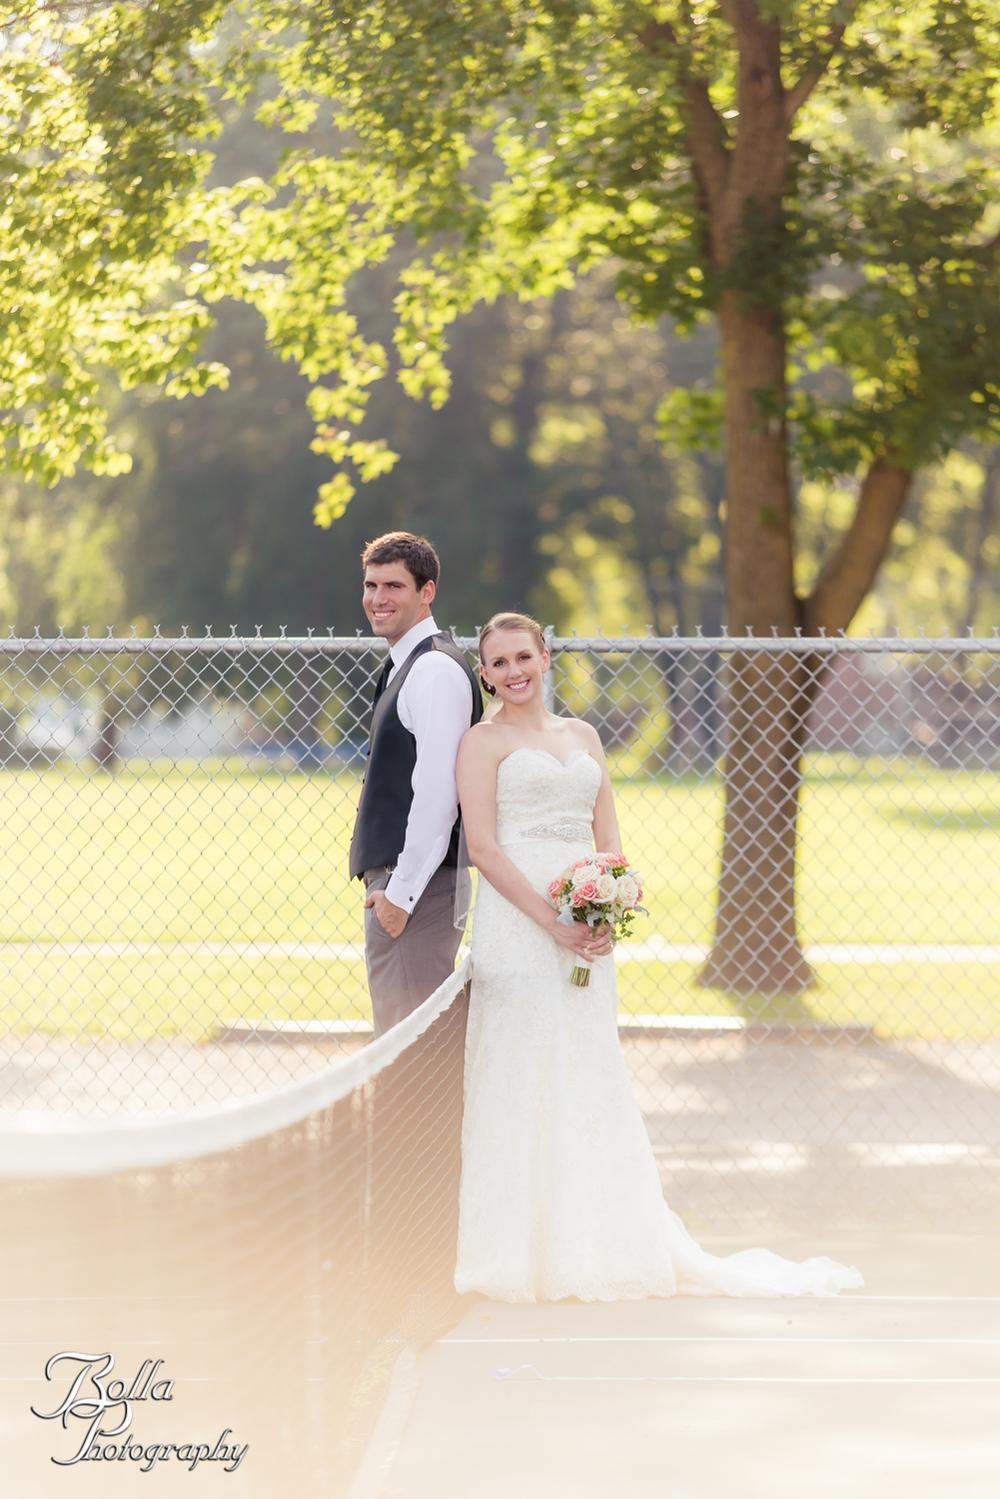 Bolla_Photography_St_Louis_wedding_photographer-0004.jpg